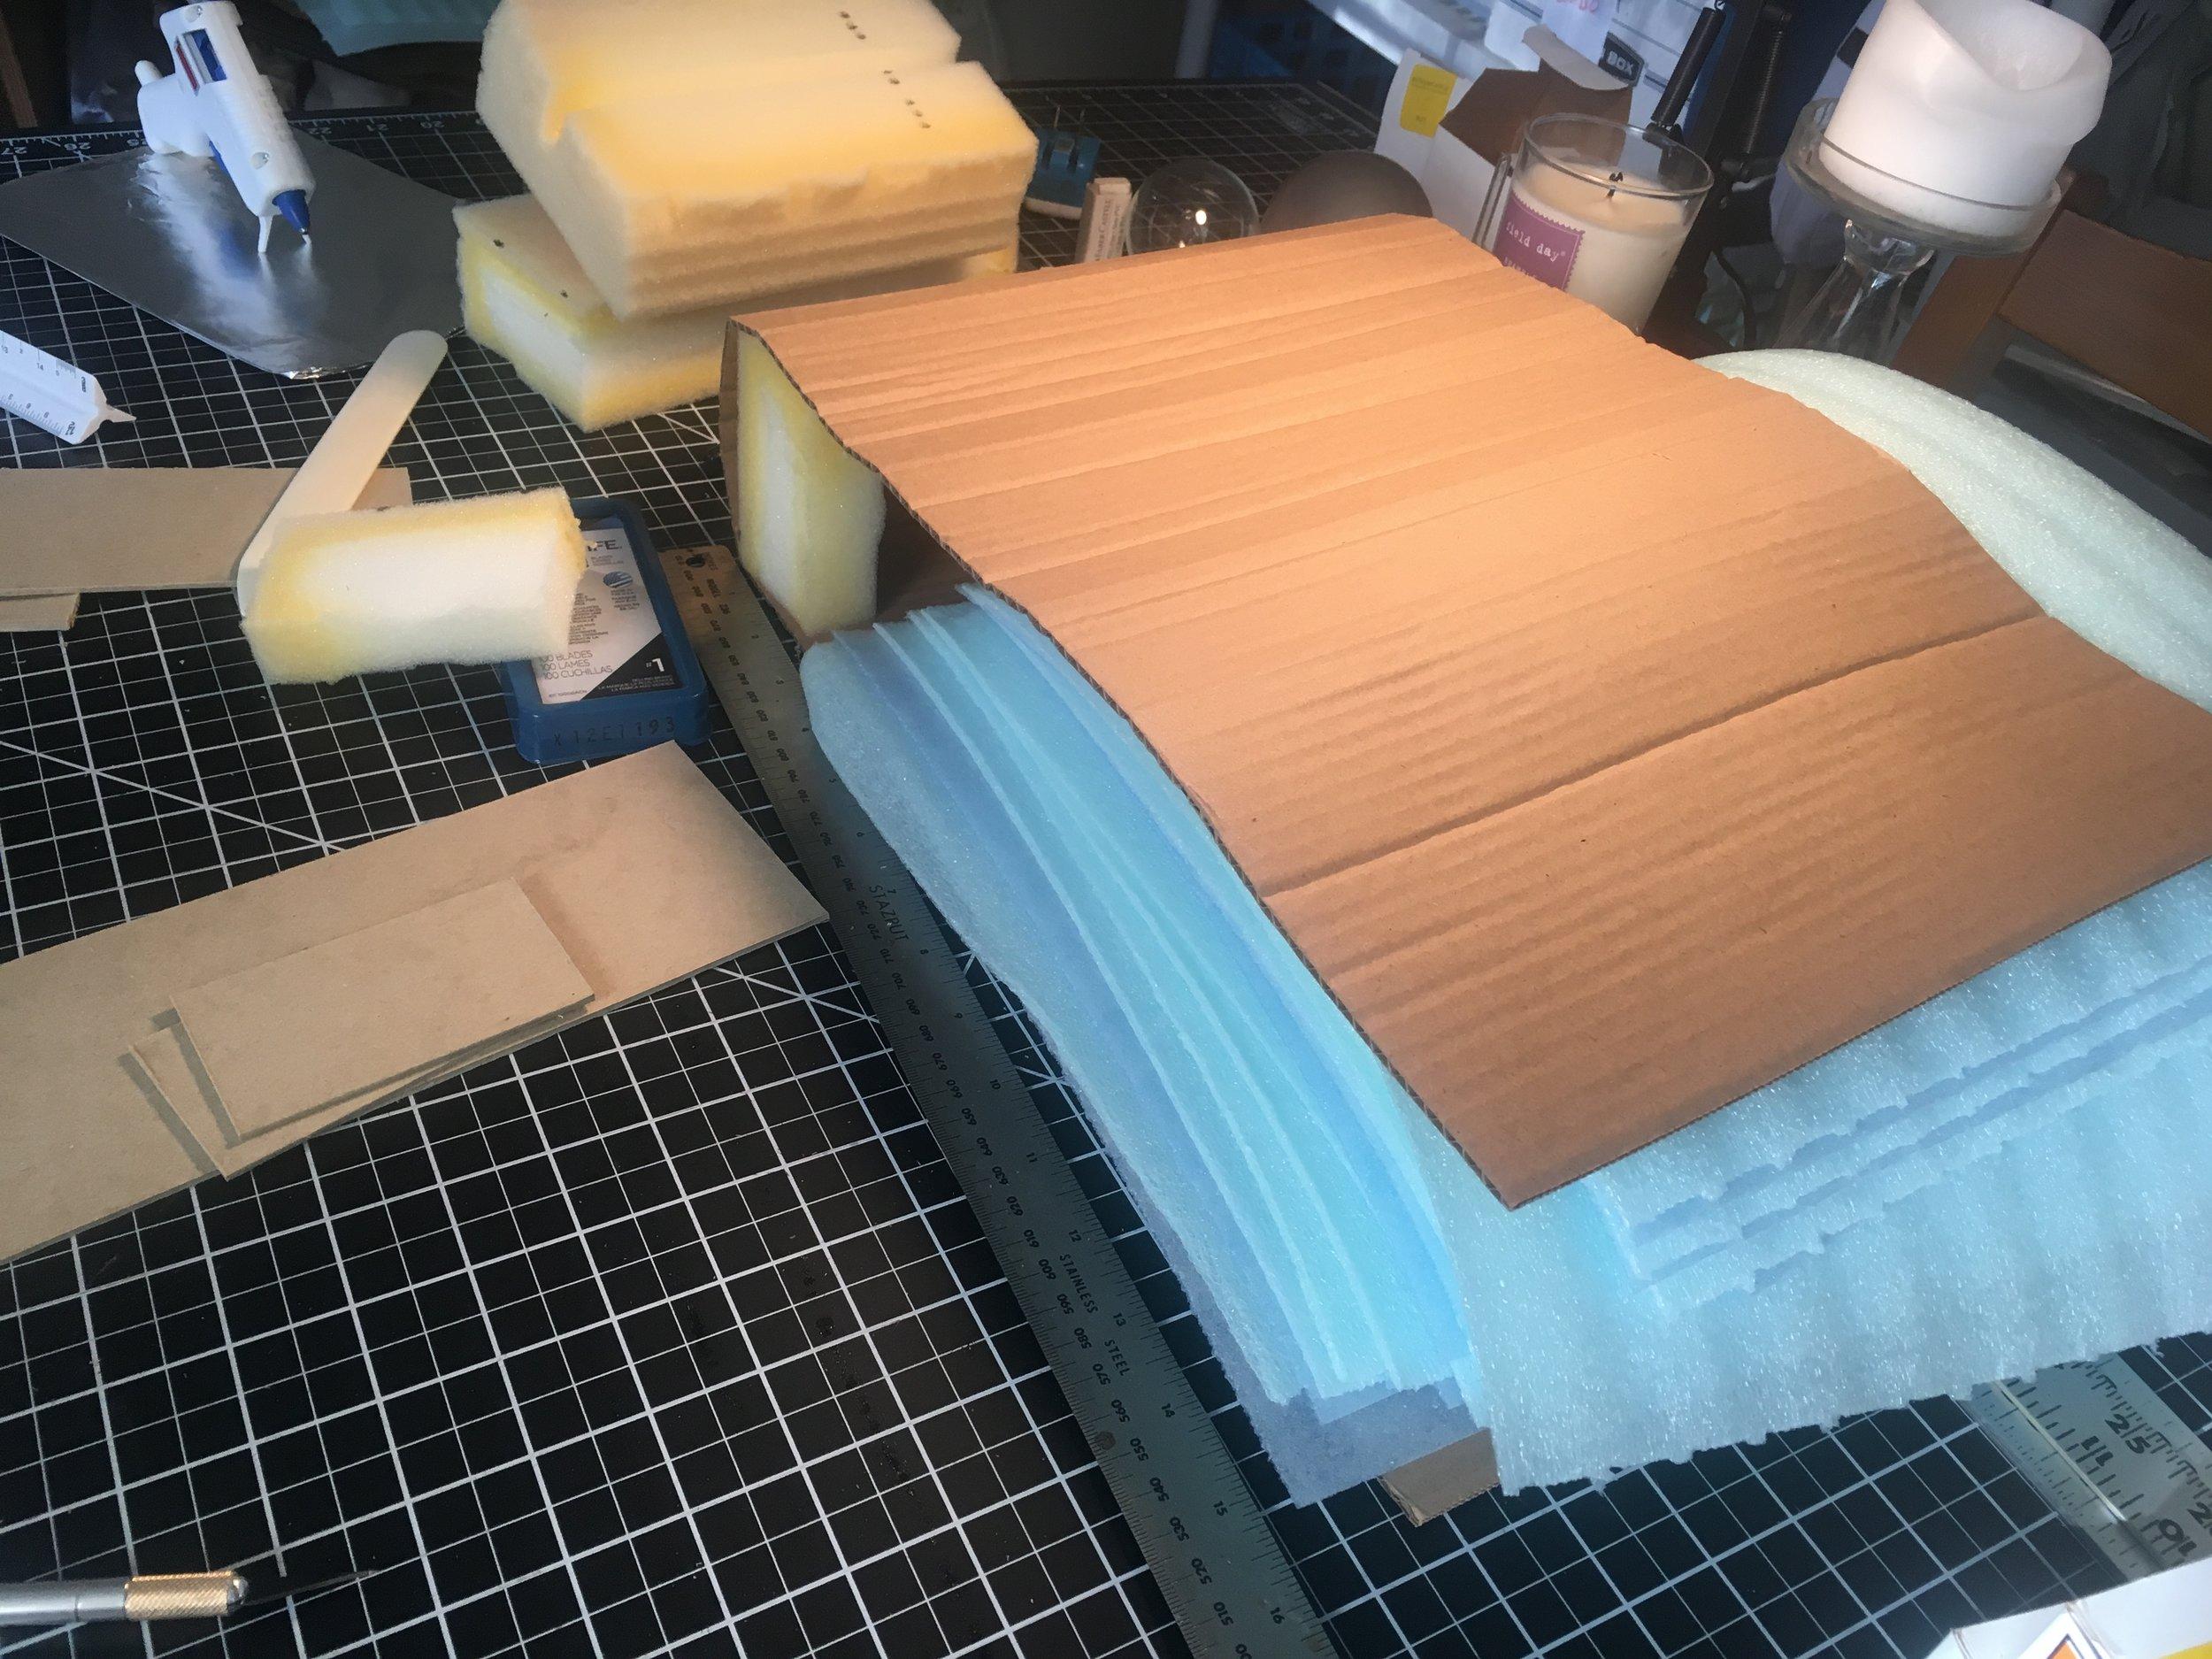 Packing Materials 013.jpg